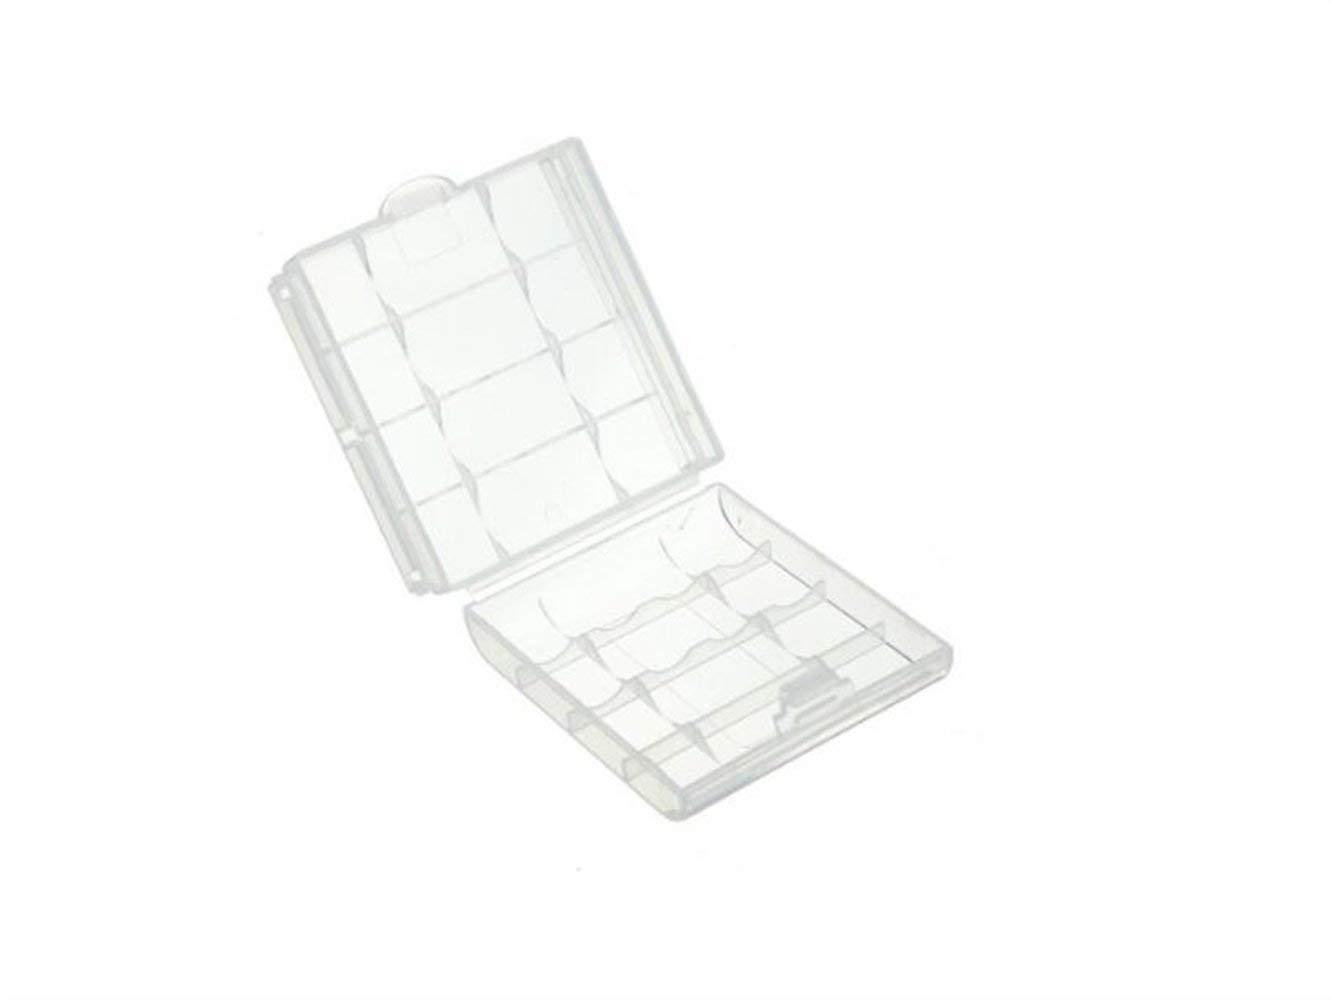 Yuchoi Perfectly Shaped 5Pcs AA/AAA Battery Hard Plastic Battery Case Holder Storage Box(Transparent)